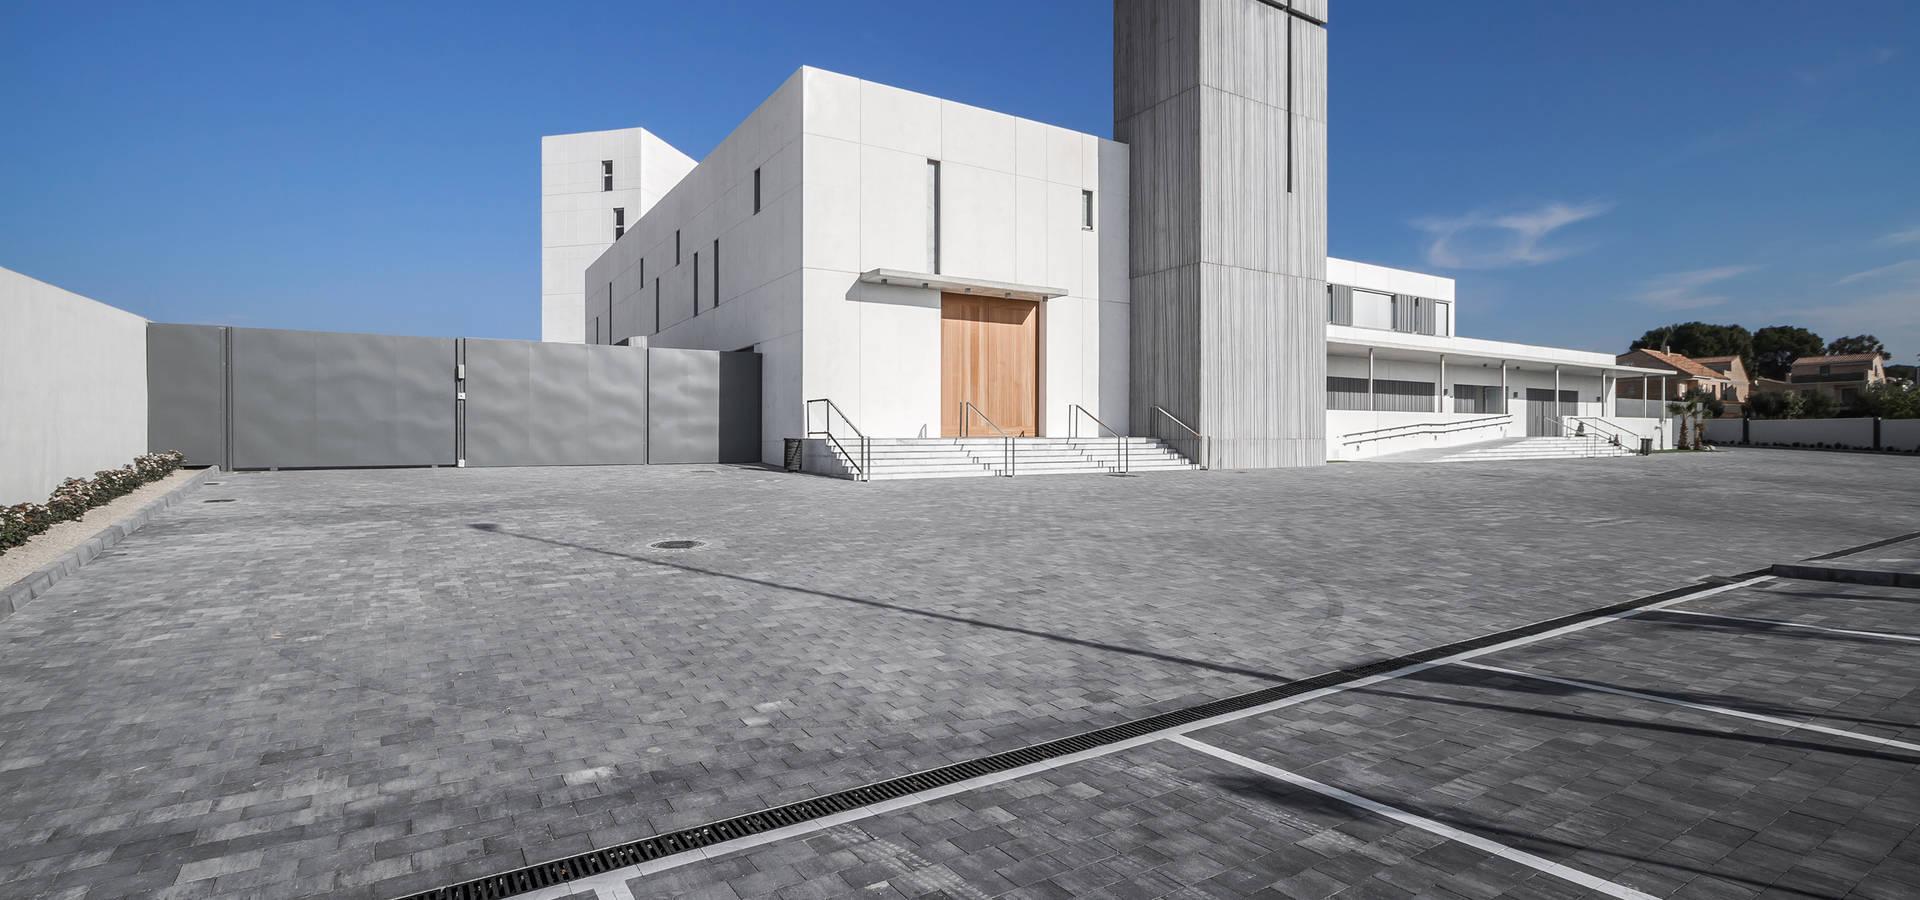 Hern ndez arquitectos arquitectos en valencia homify - Arquitectos en valencia ...